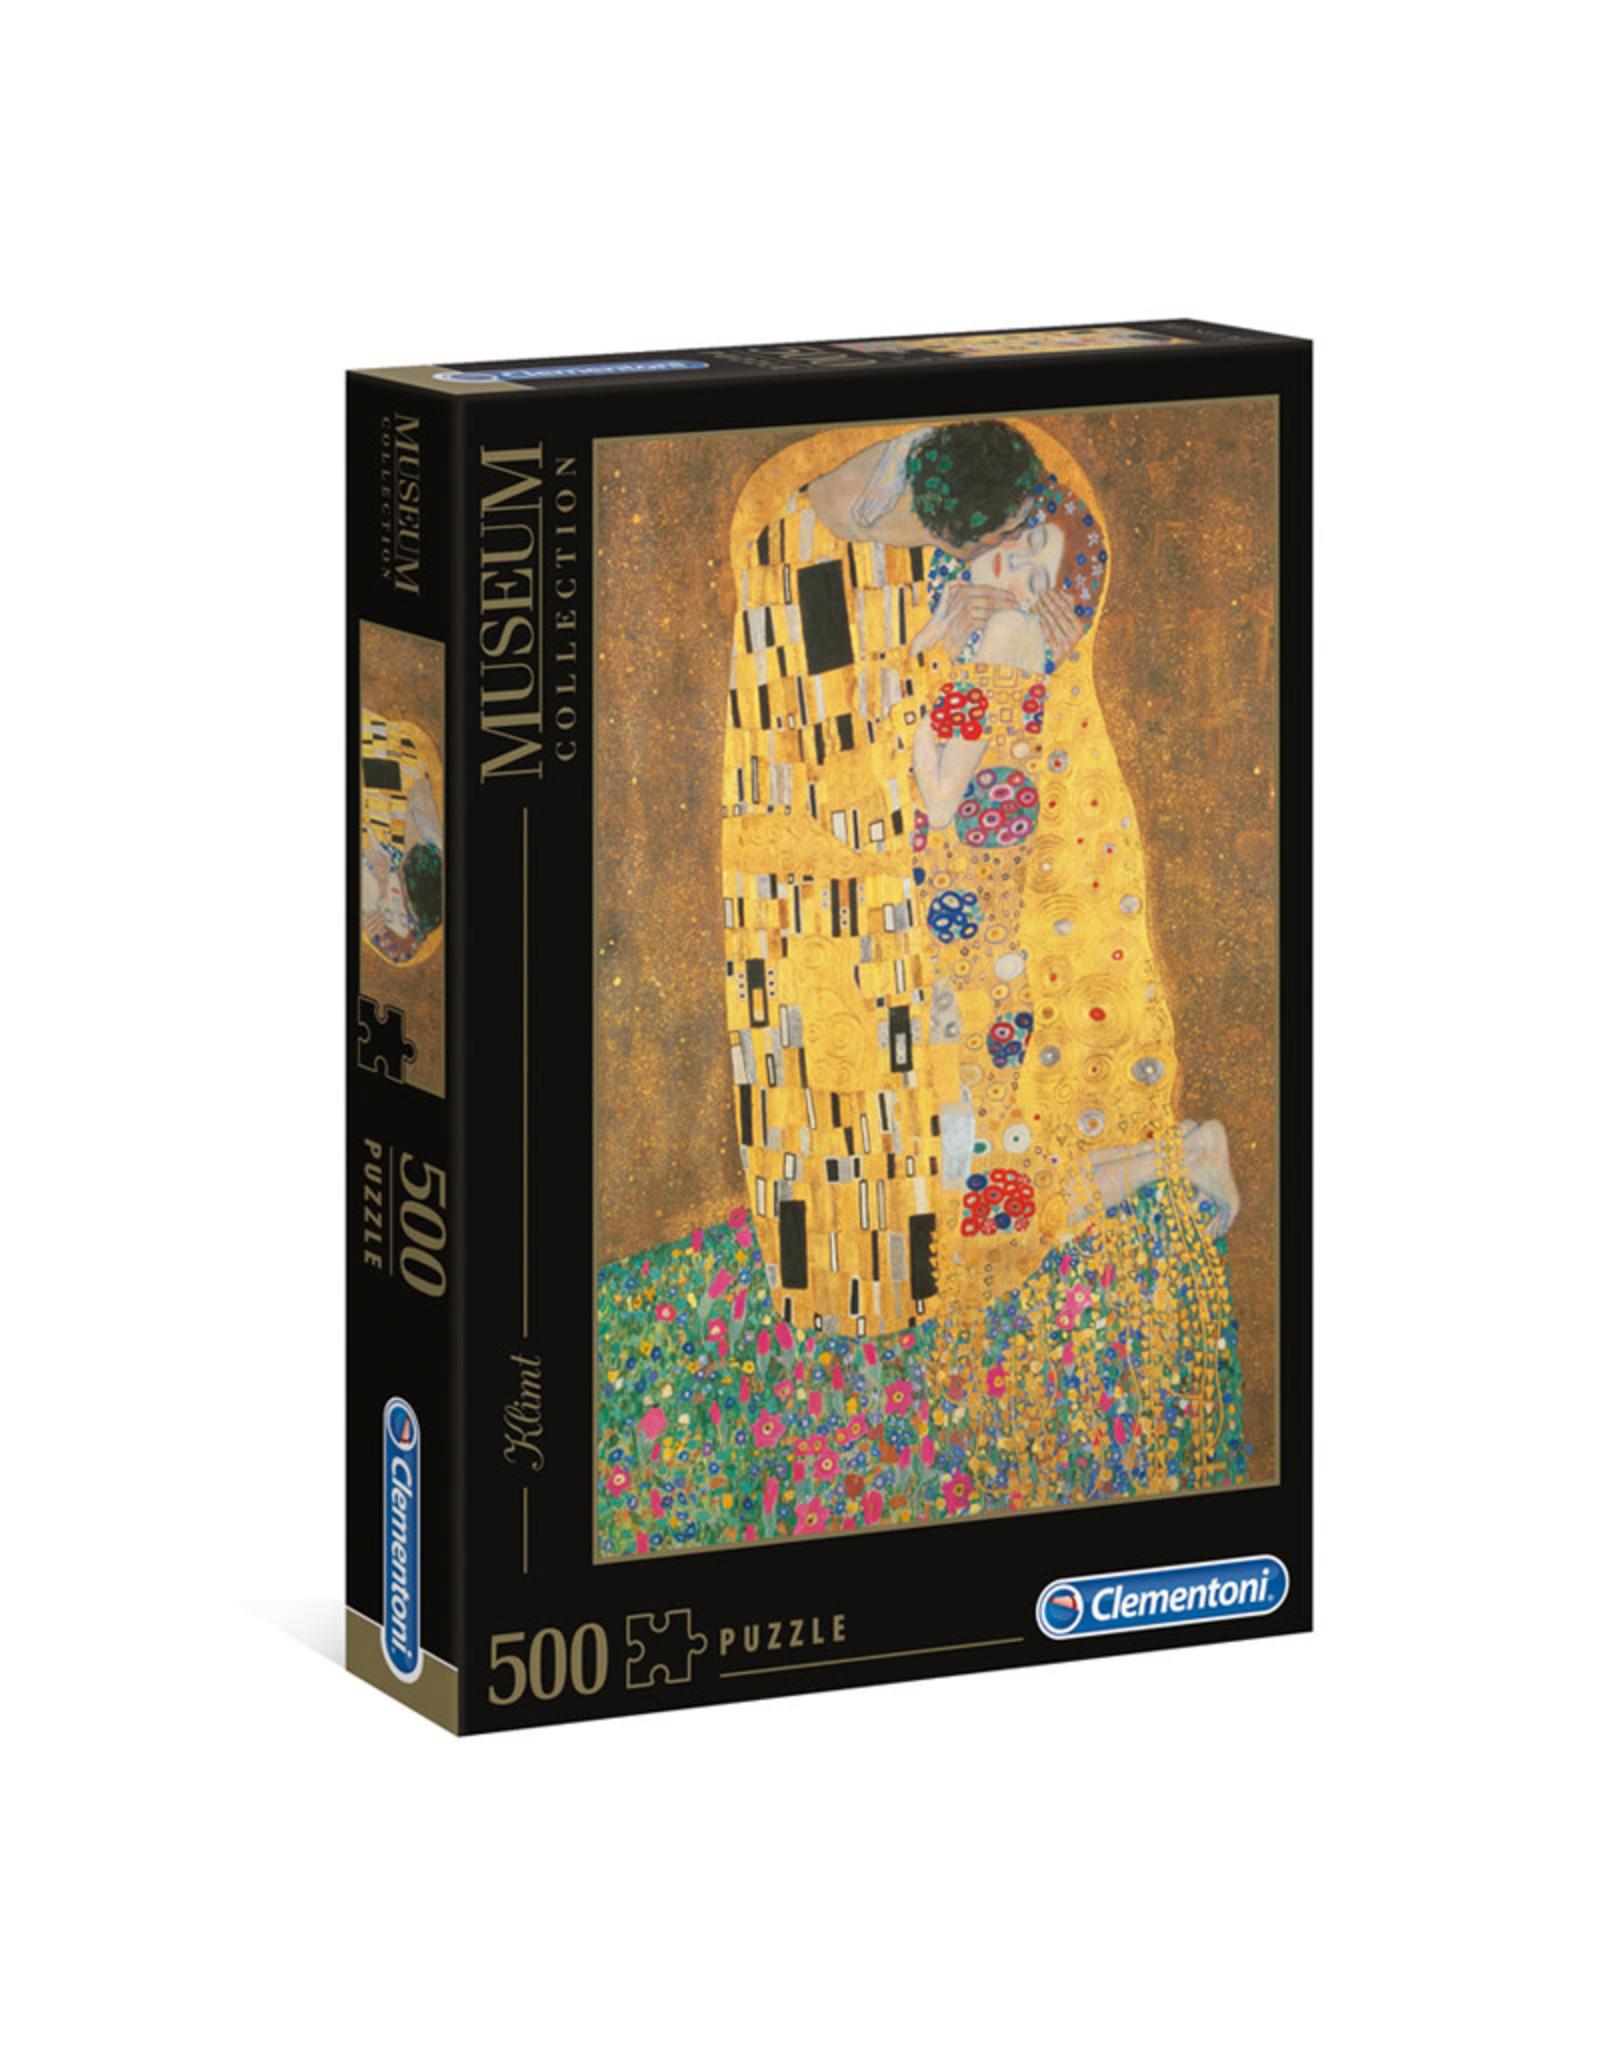 Clementoni The Kiss by Klimt 500 PCS